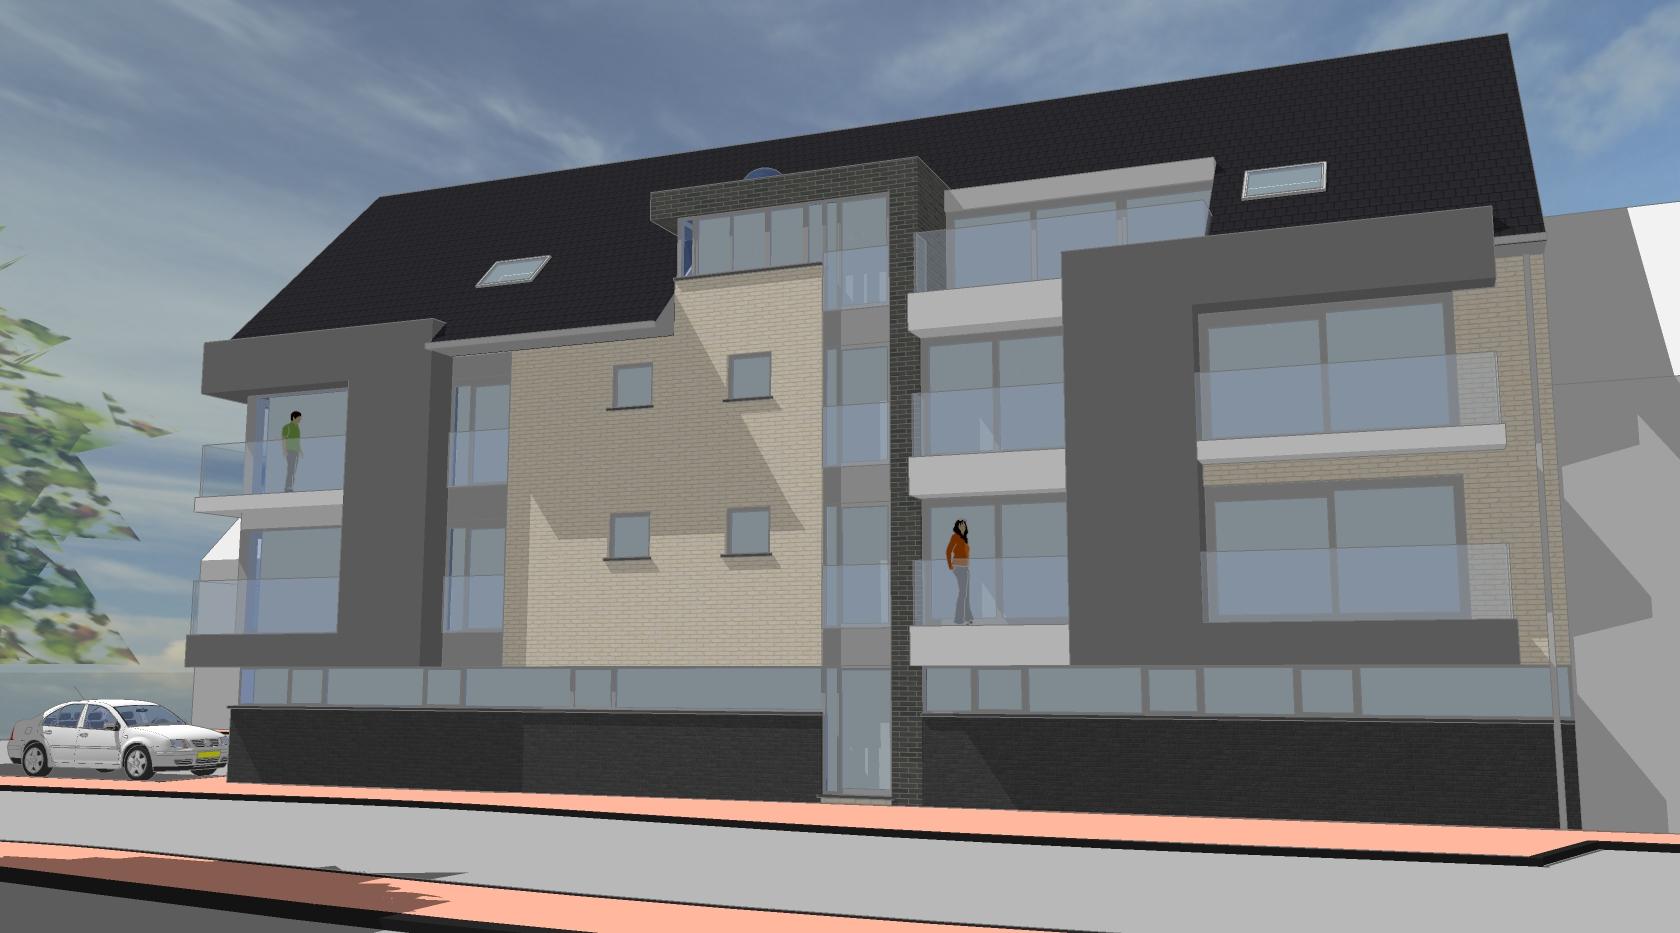 3D model Beuselinck zwarte dakpan 04.jpg